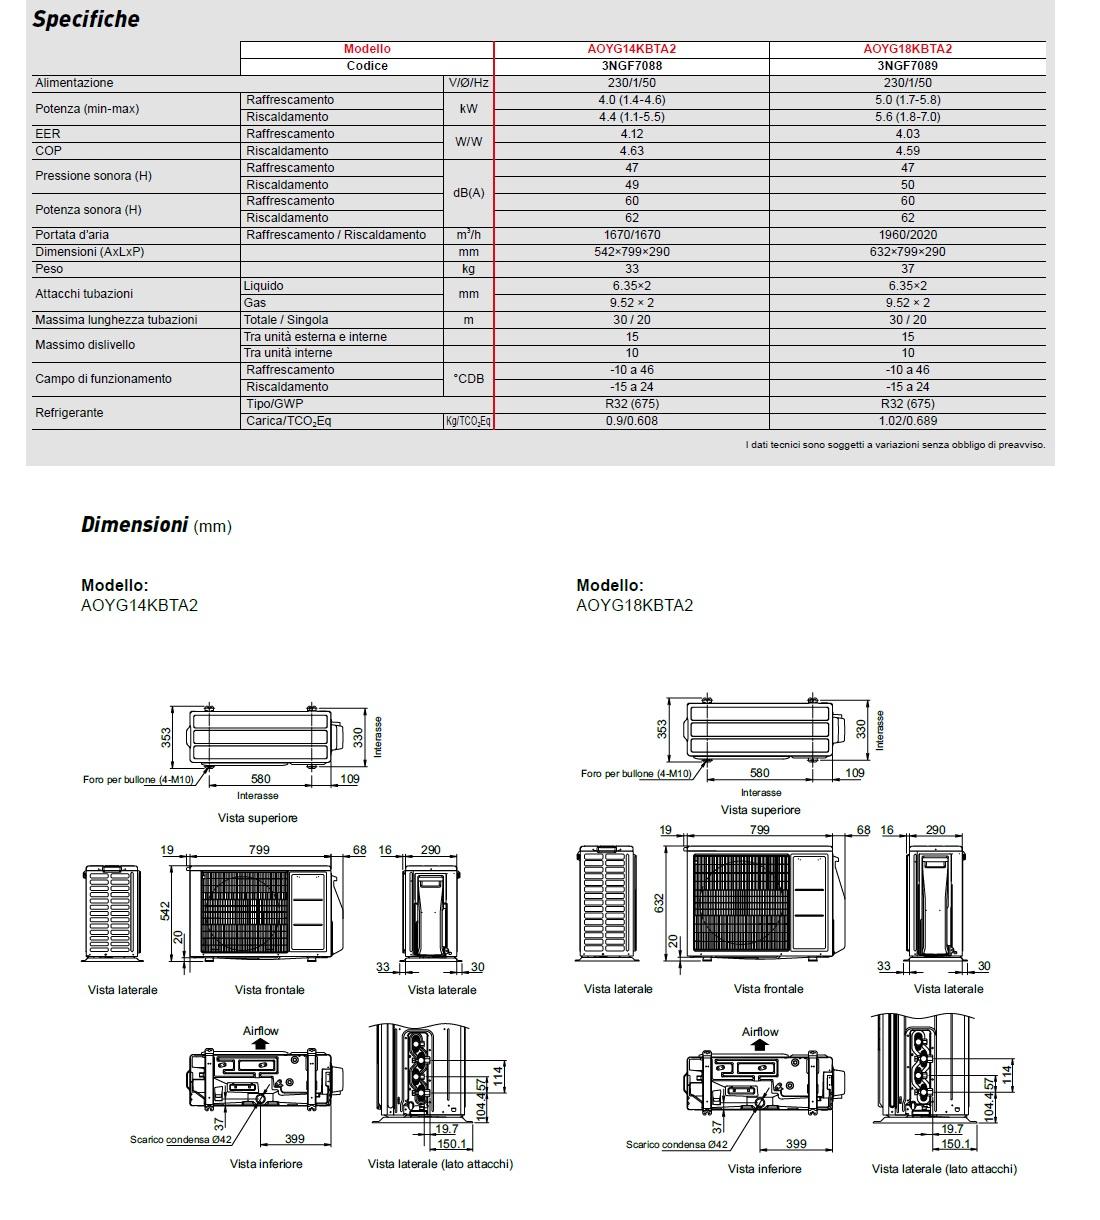 Climatizzatore Fujitsu Dual Split Parete 12+12 KE Bianco AOYG18KBTA2